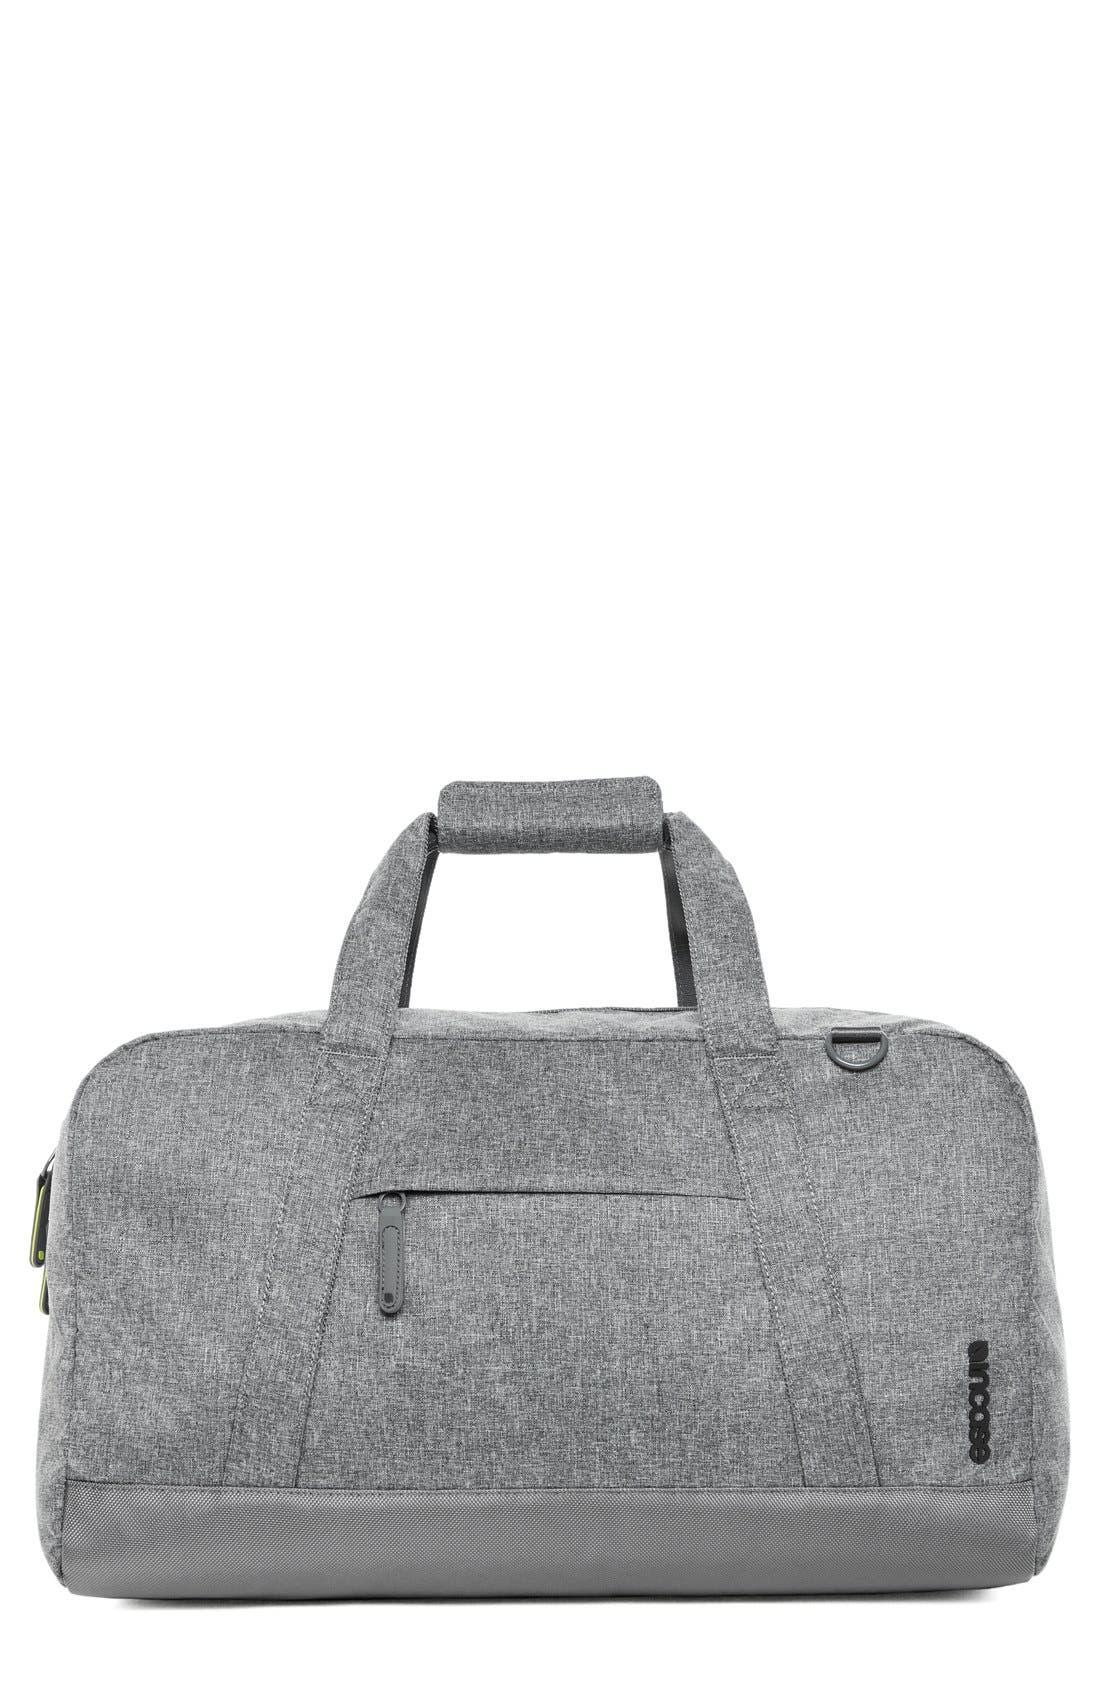 Incase Designs EO Duffel Bag